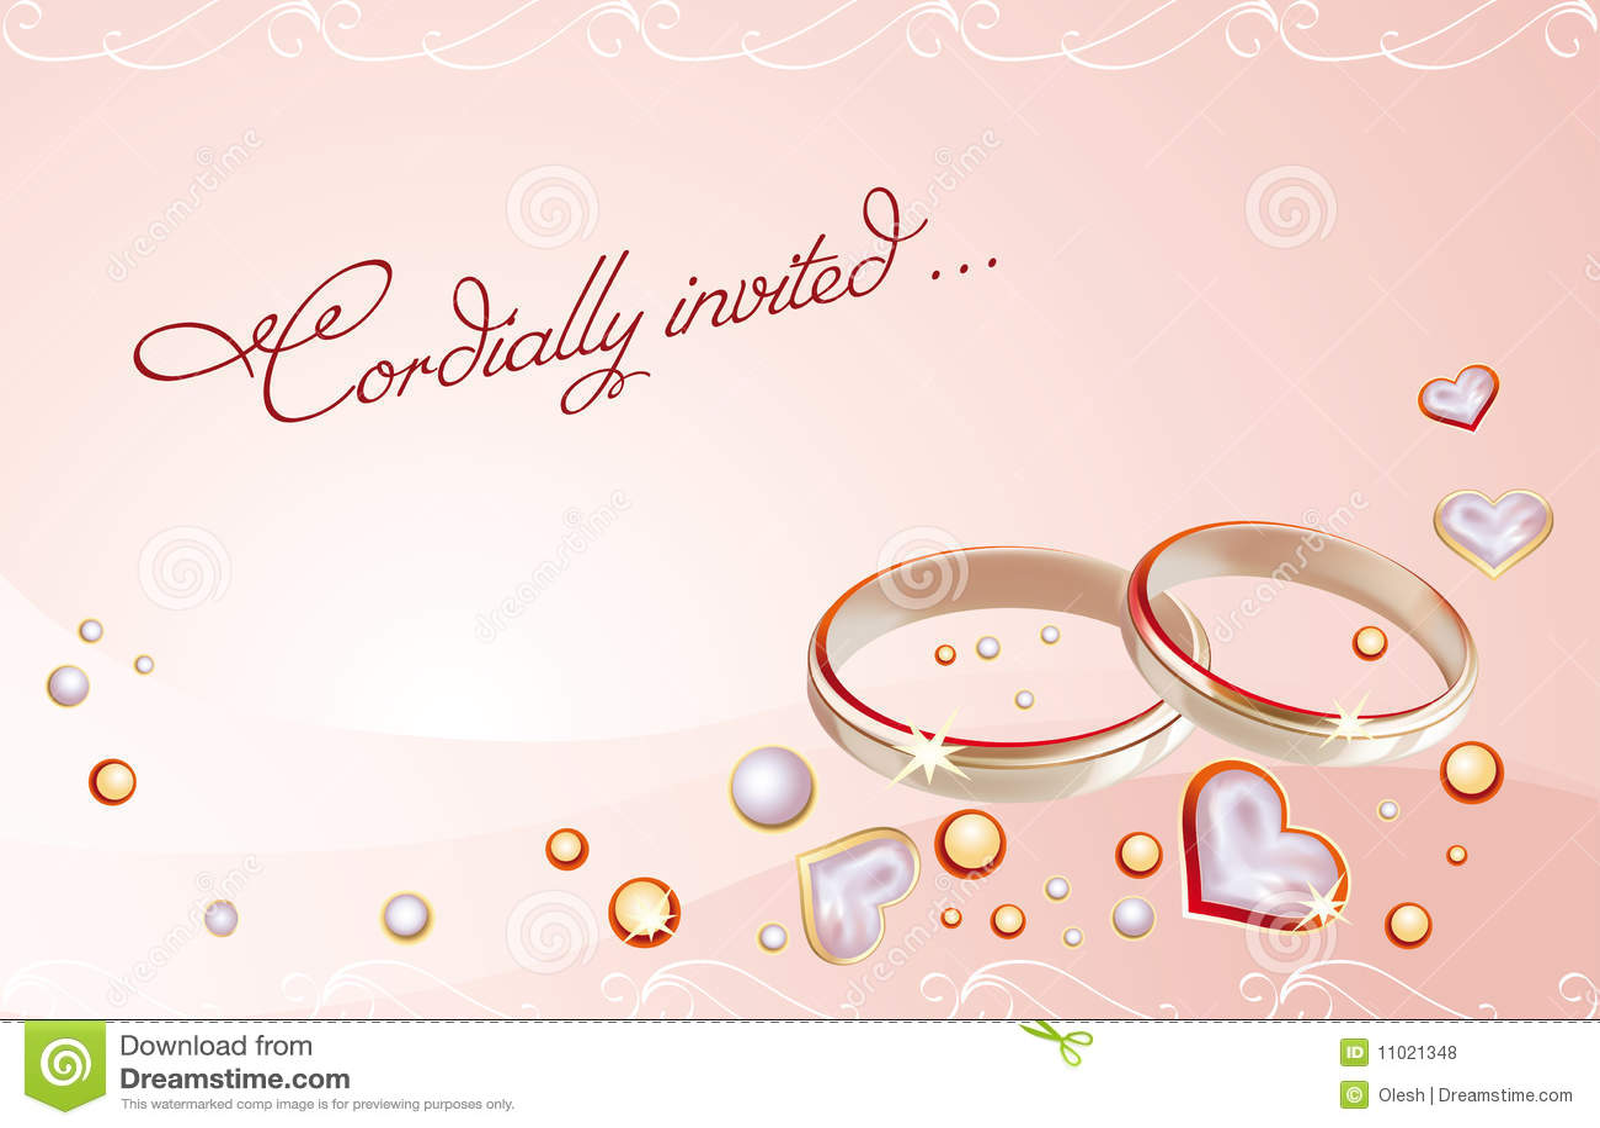 Blank Wedding Invitation Designs with beautiful invitation template